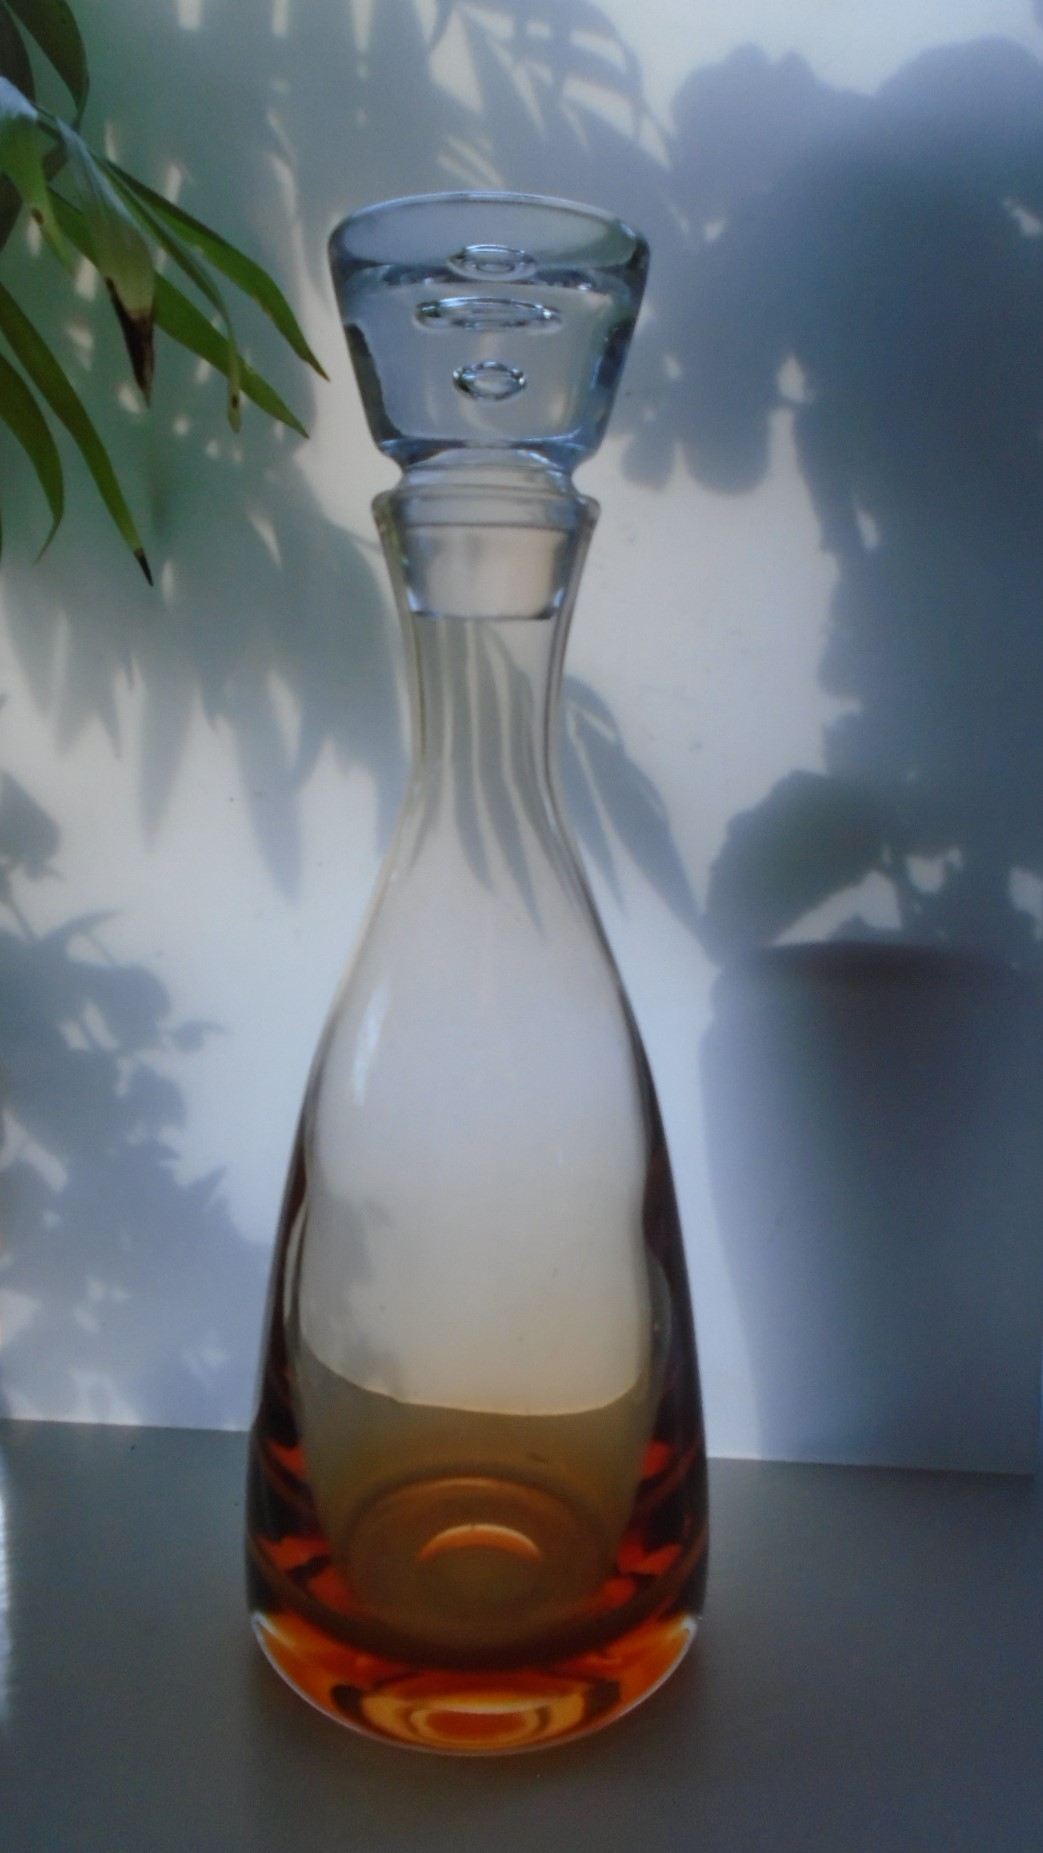 Classic Wedgwood/Kings Lynn Glass Ronald Stennett-Willson 12ins high Decanter RSW43